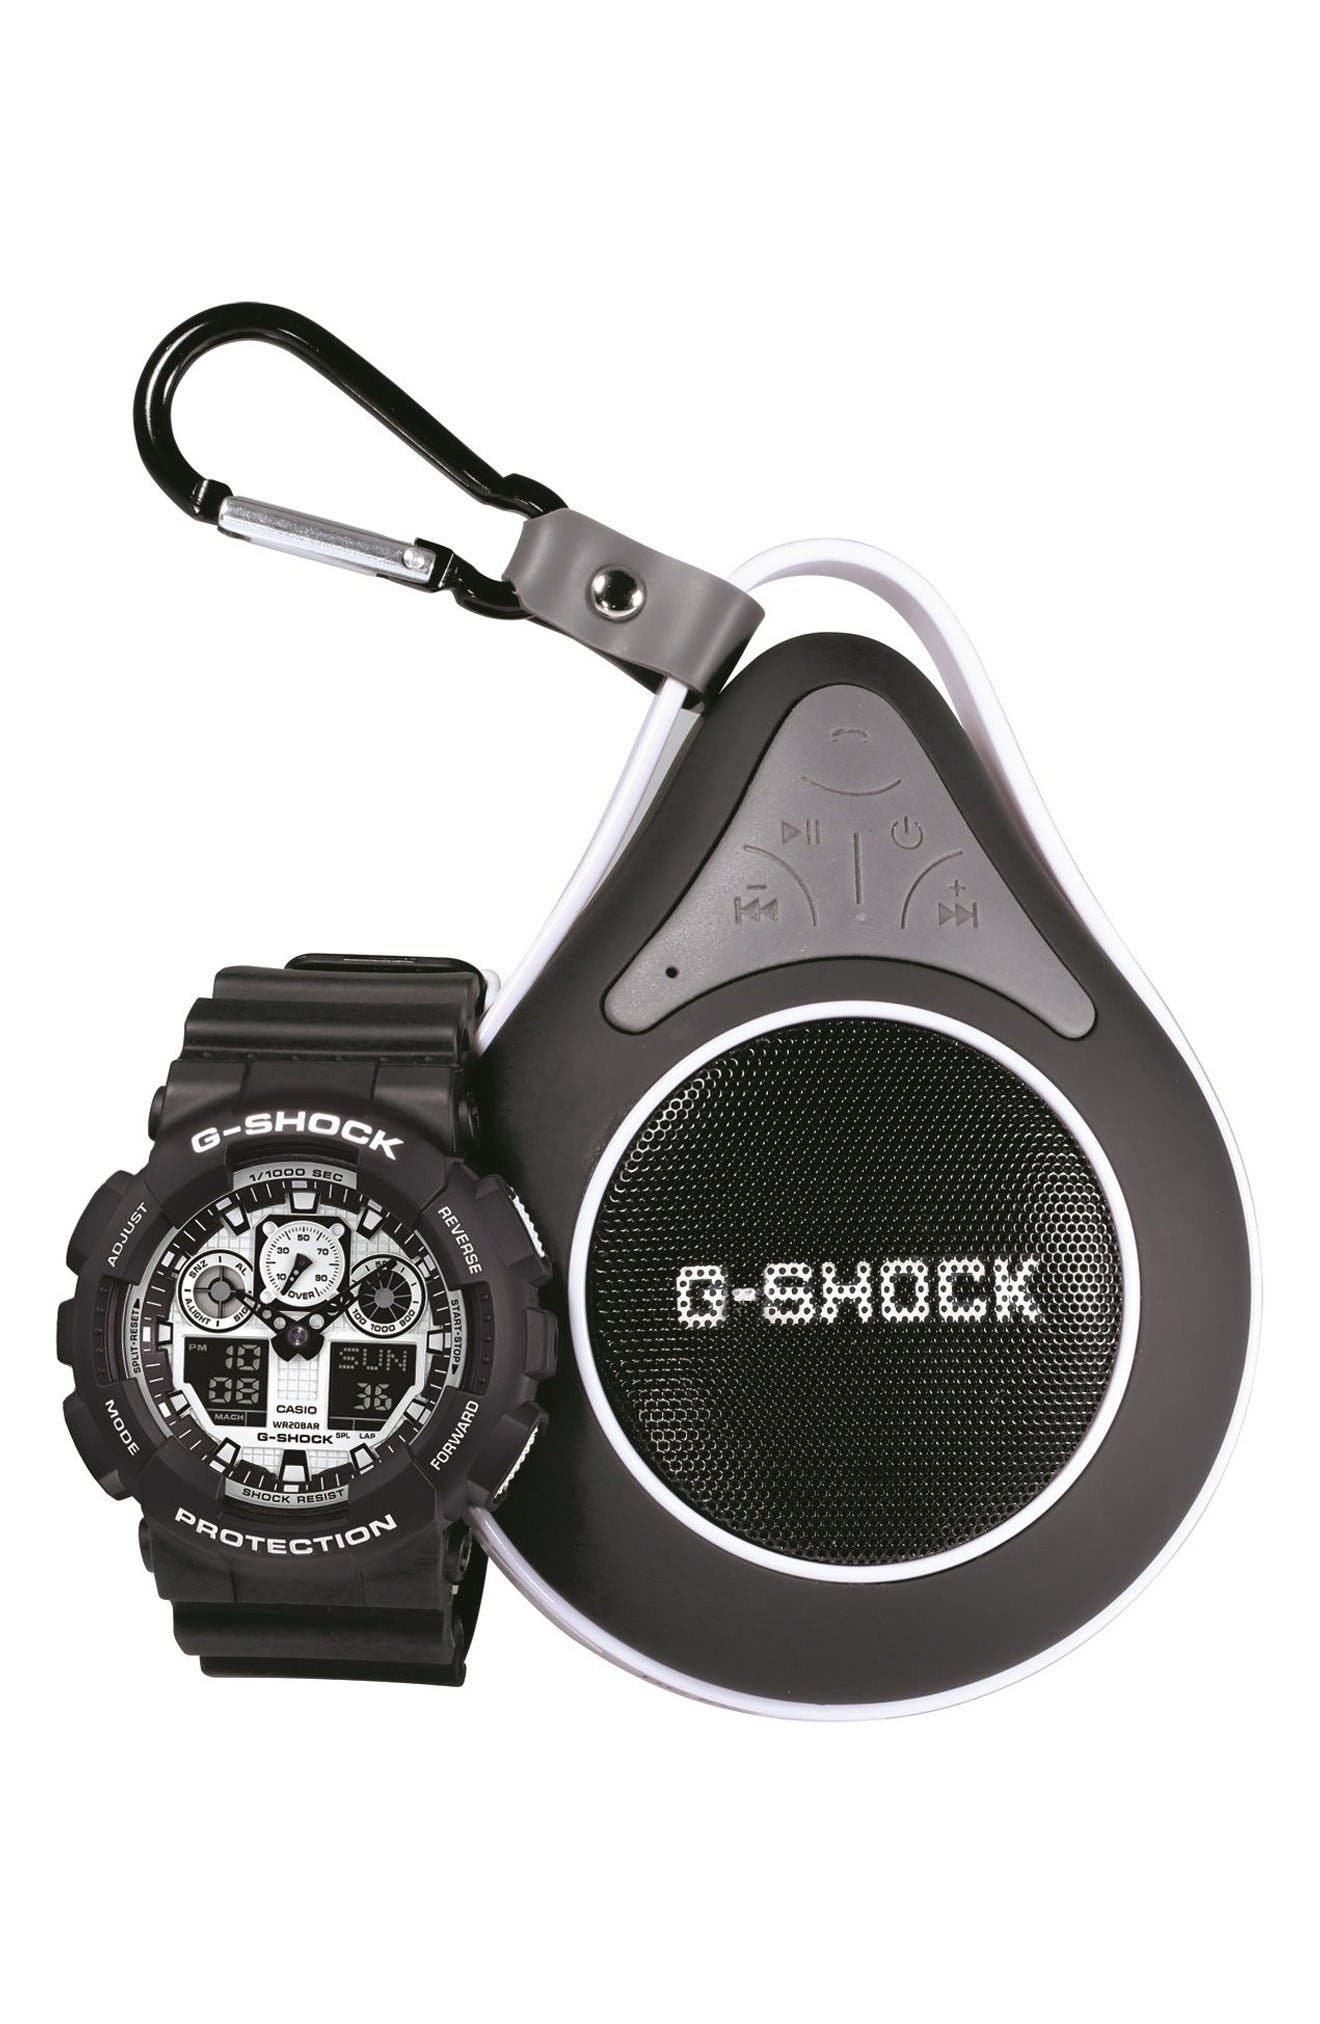 G-SHOCK BABY-G G-Shock Ana-Digi Watch & Speaker Set, 55mm